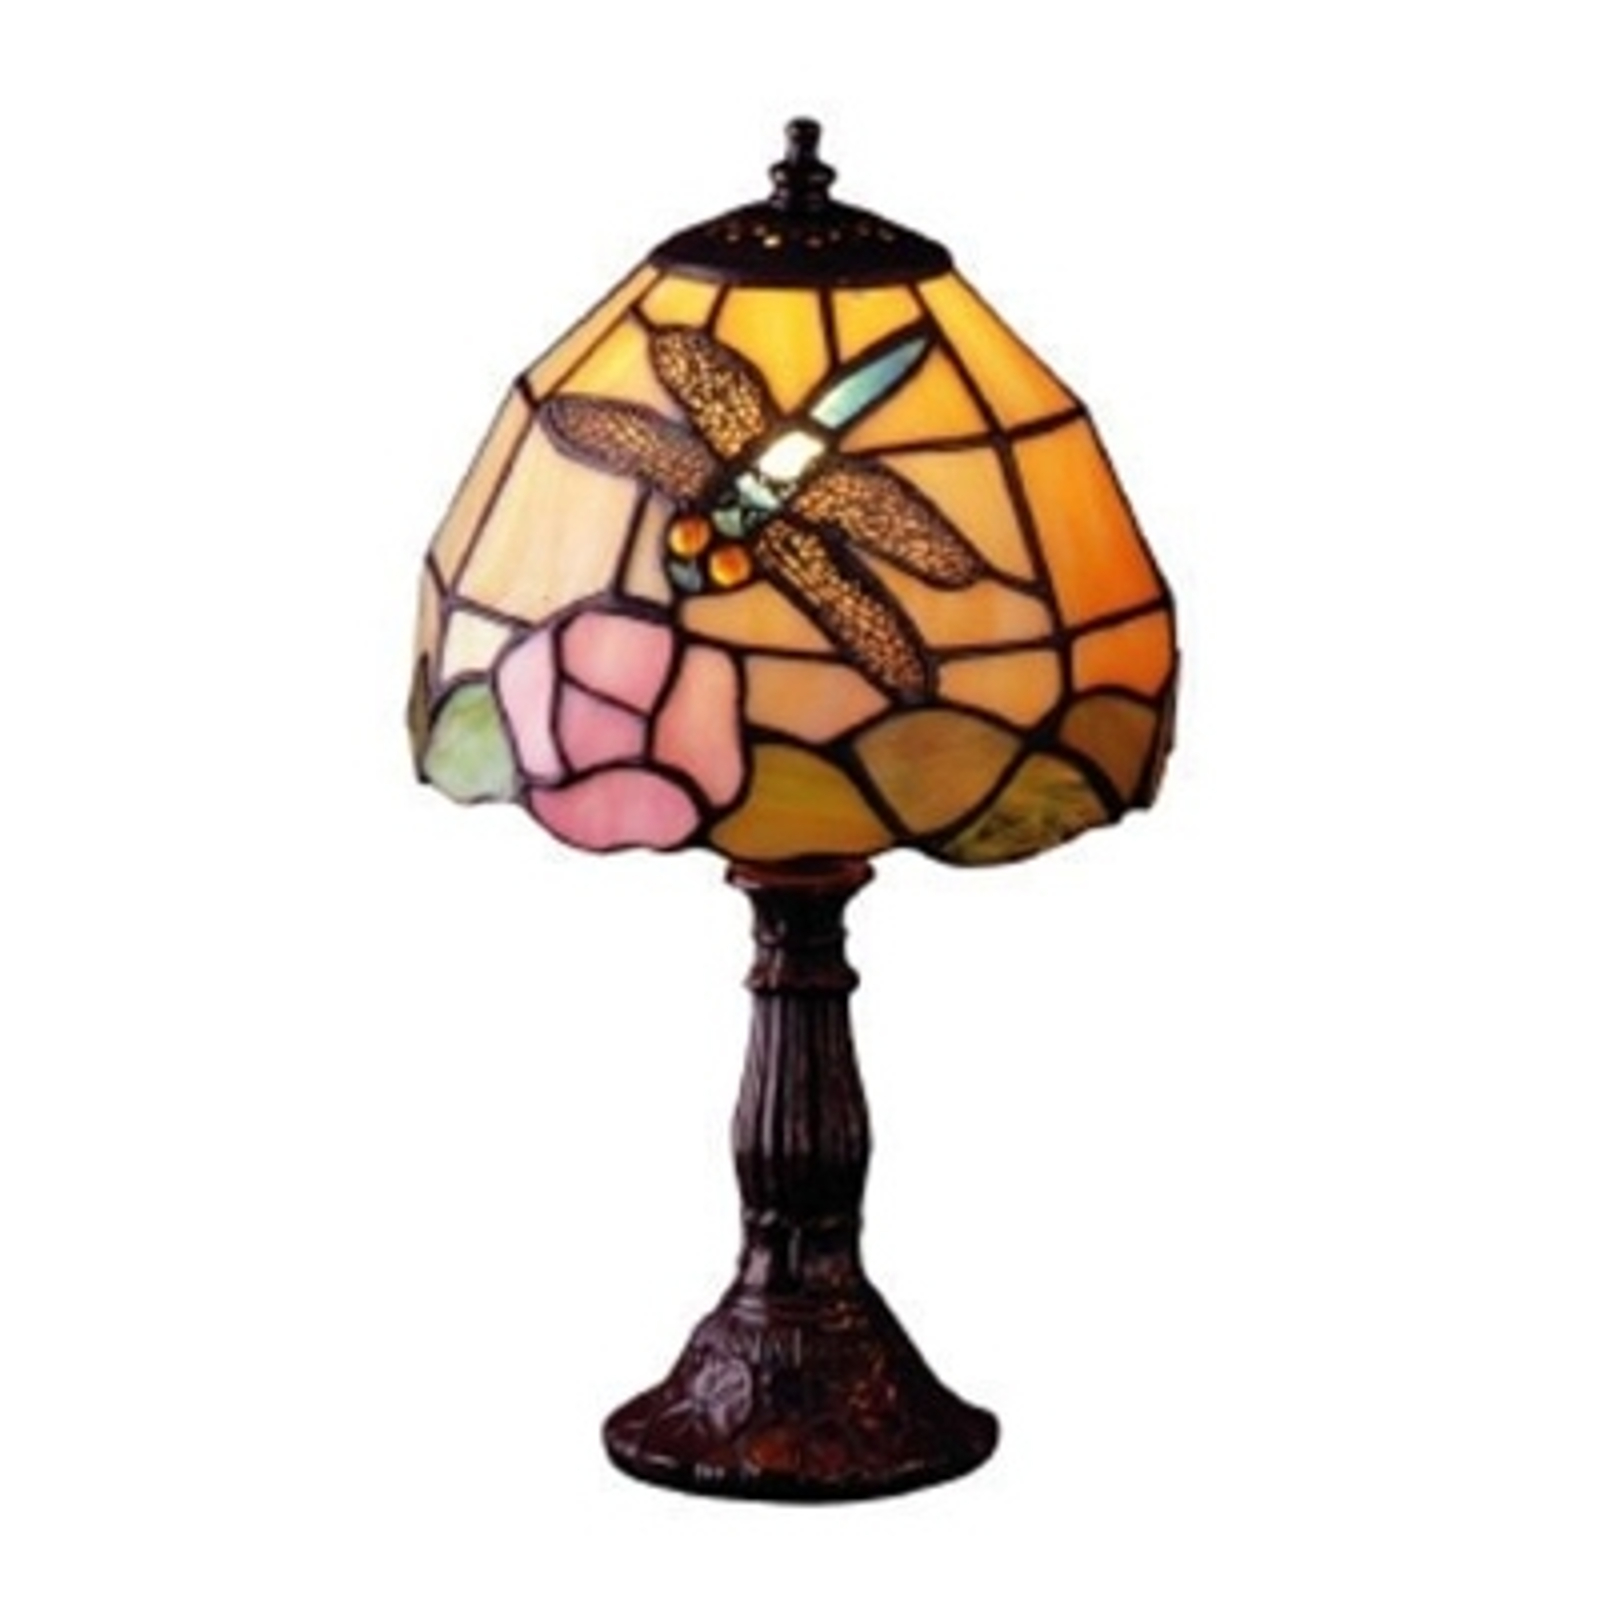 Tiffany style table lamp JANNEKE_1032197_1